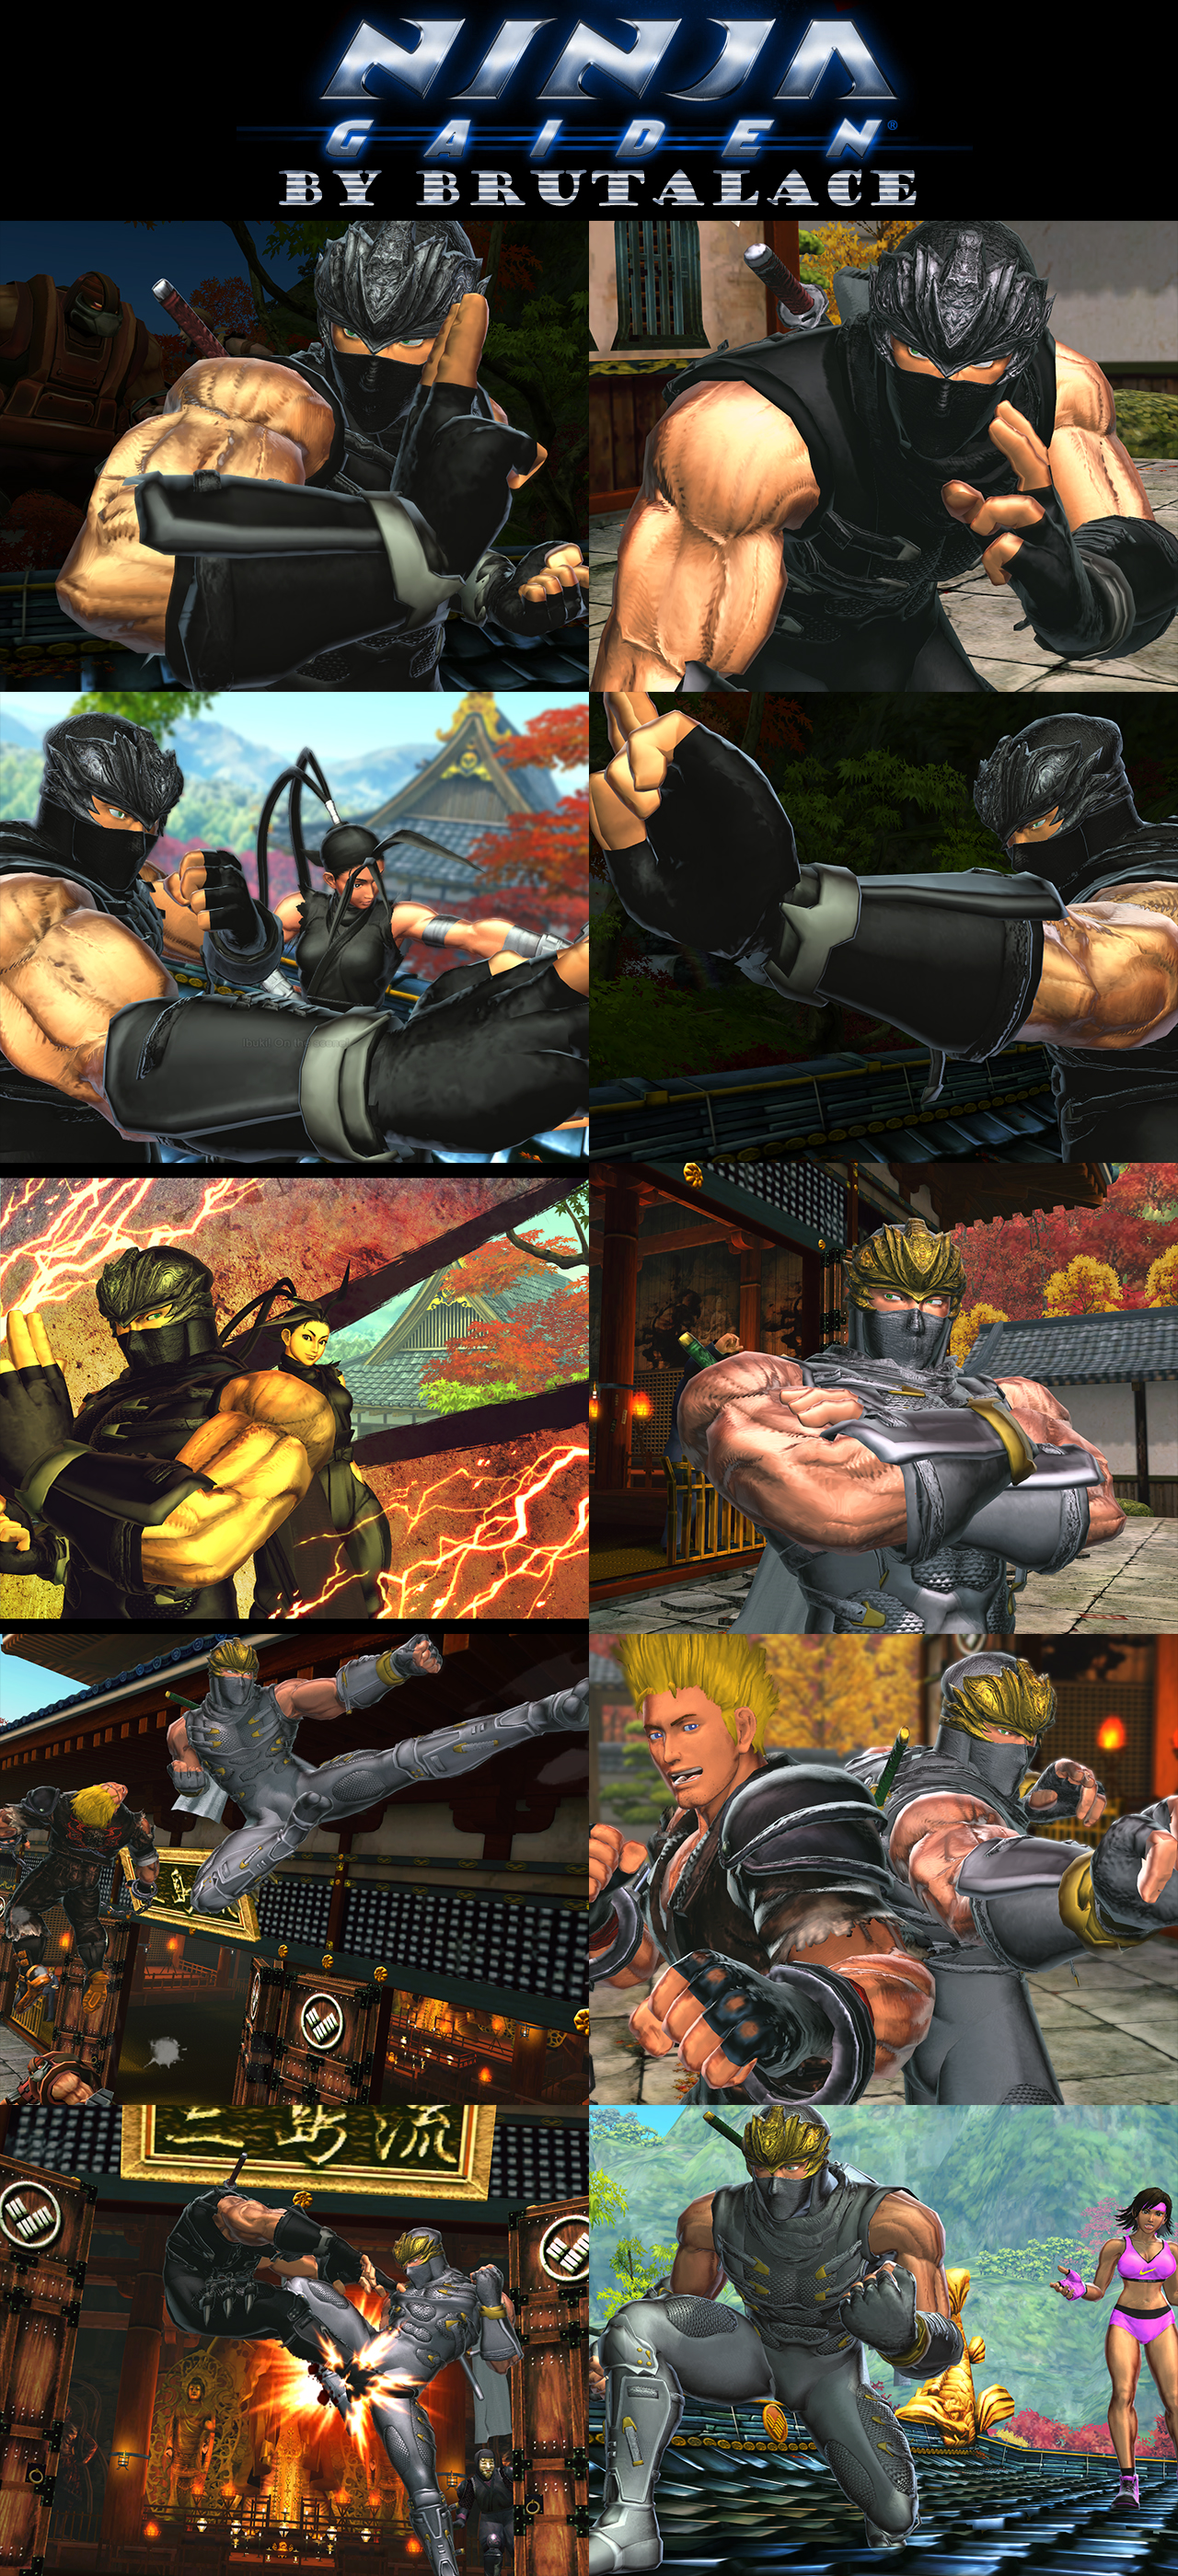 Ninja Gaiden (Ryu Hayabusa) By BrutalAce by BrutalAce